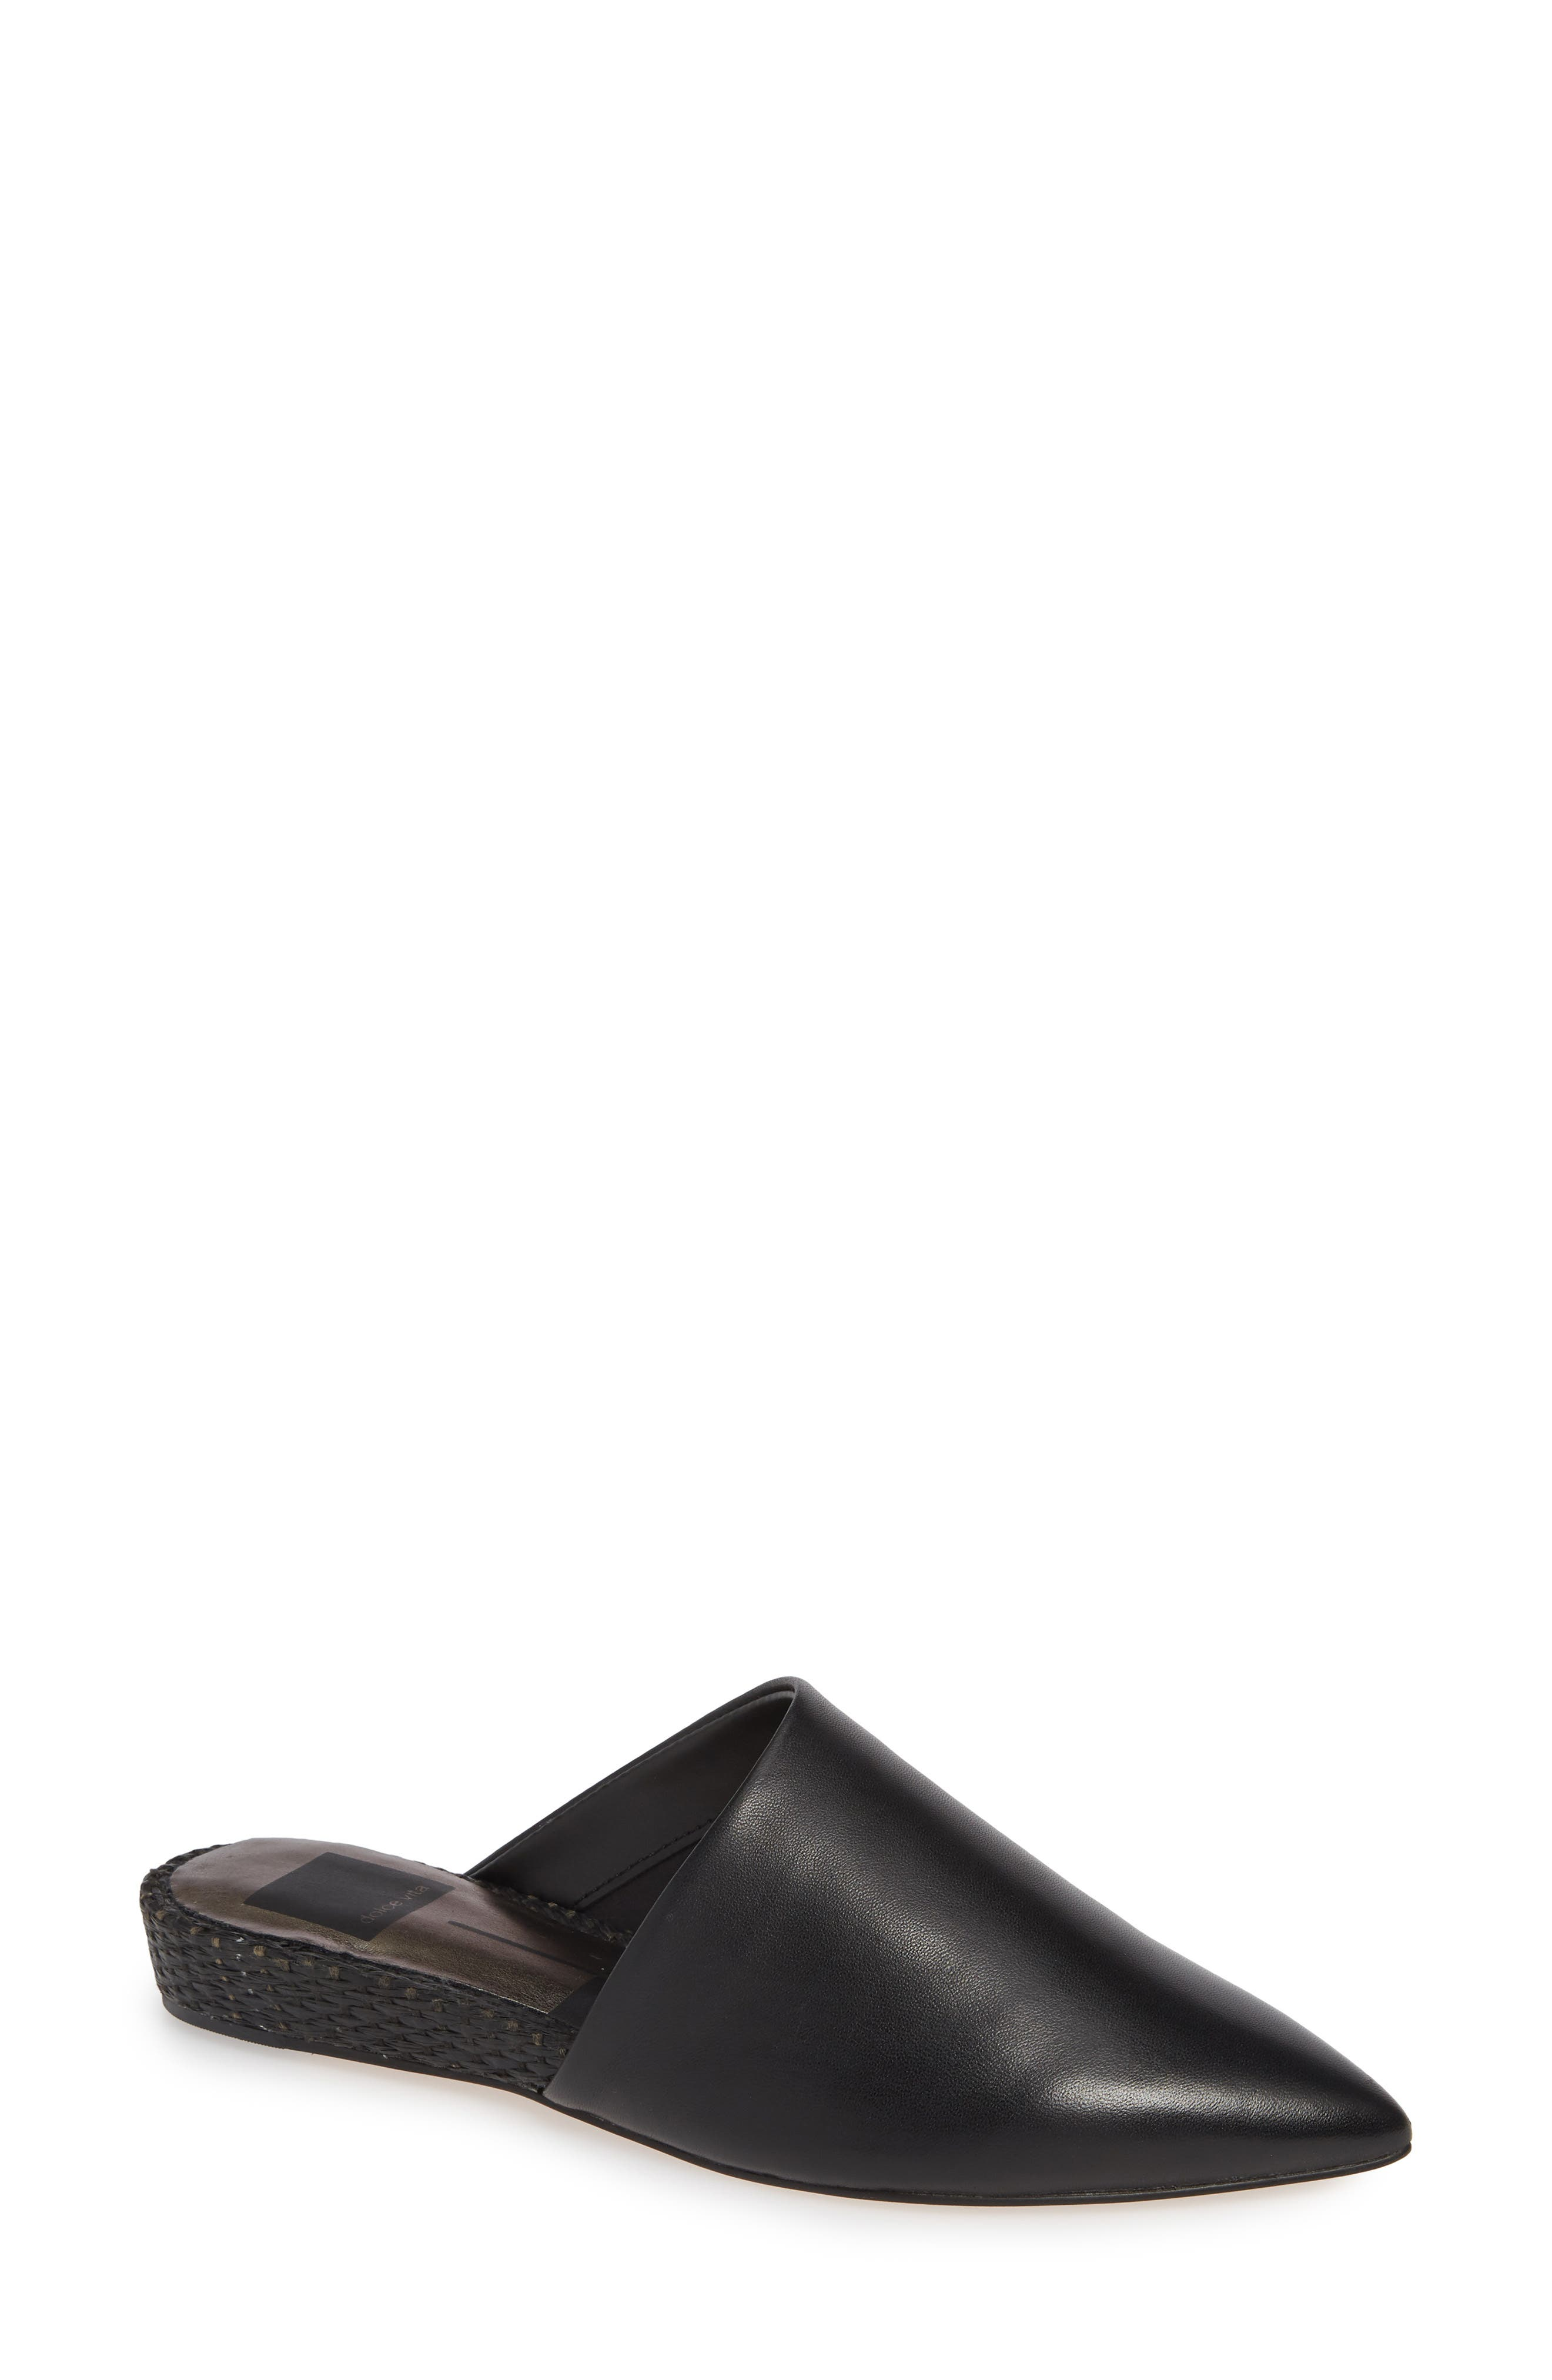 DOLCE VITA Ekko Asymmetrical Mule in Black Leather